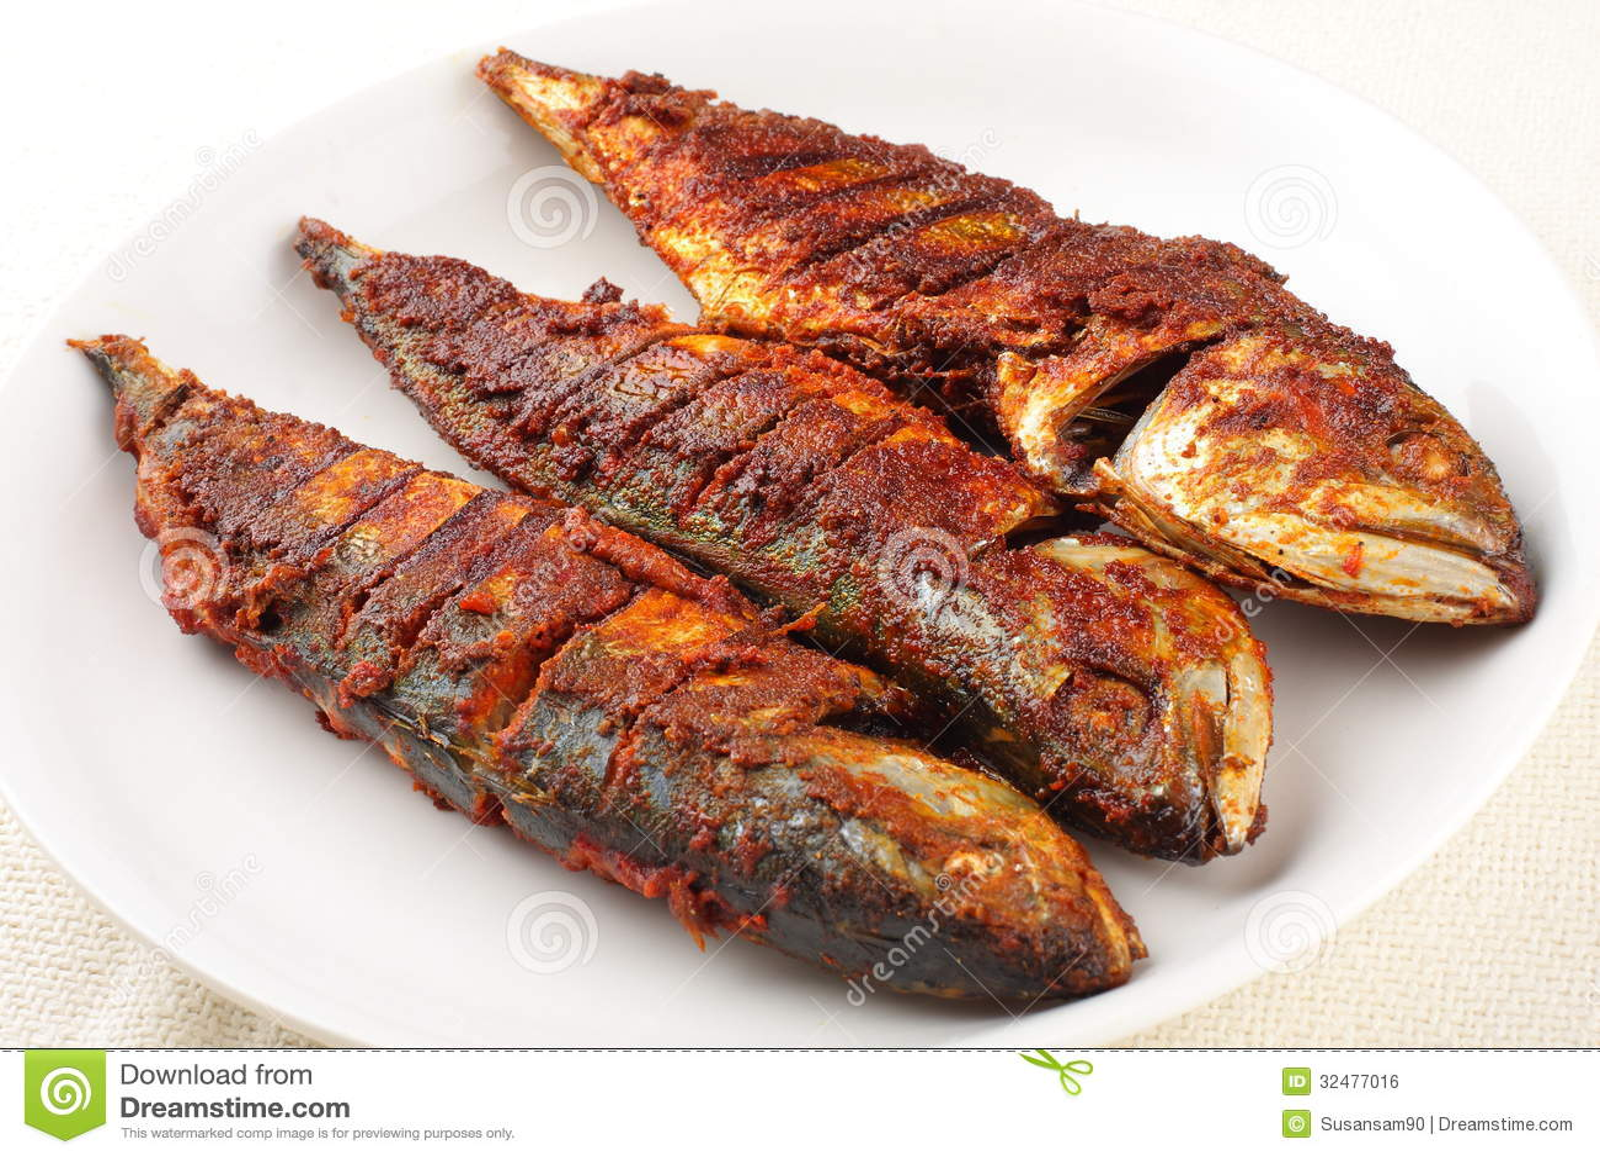 Mackerel Deep Fry Royalty Free Stock Image - Image: 32477016